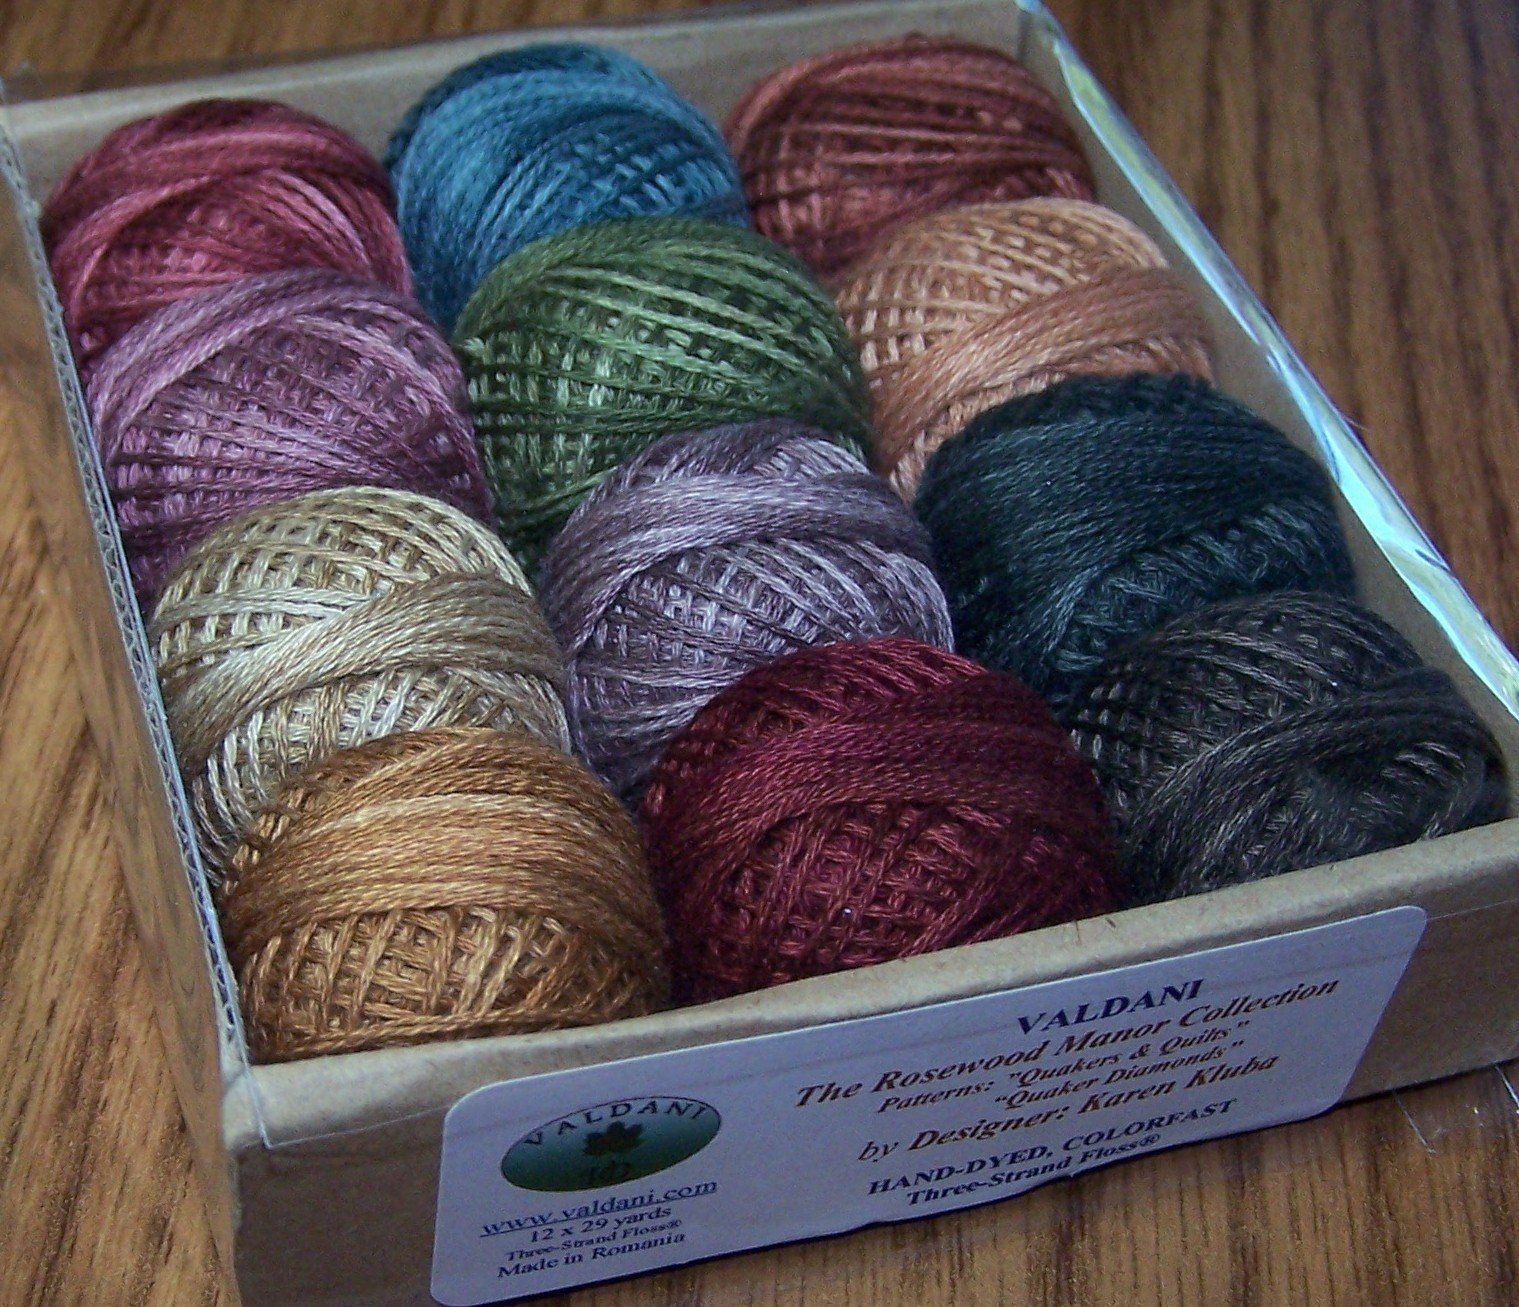 Valdani 3-strand cotton floss - Quaker Diamonds/Quakers & Quilts - Rosewood Manor by Valdani